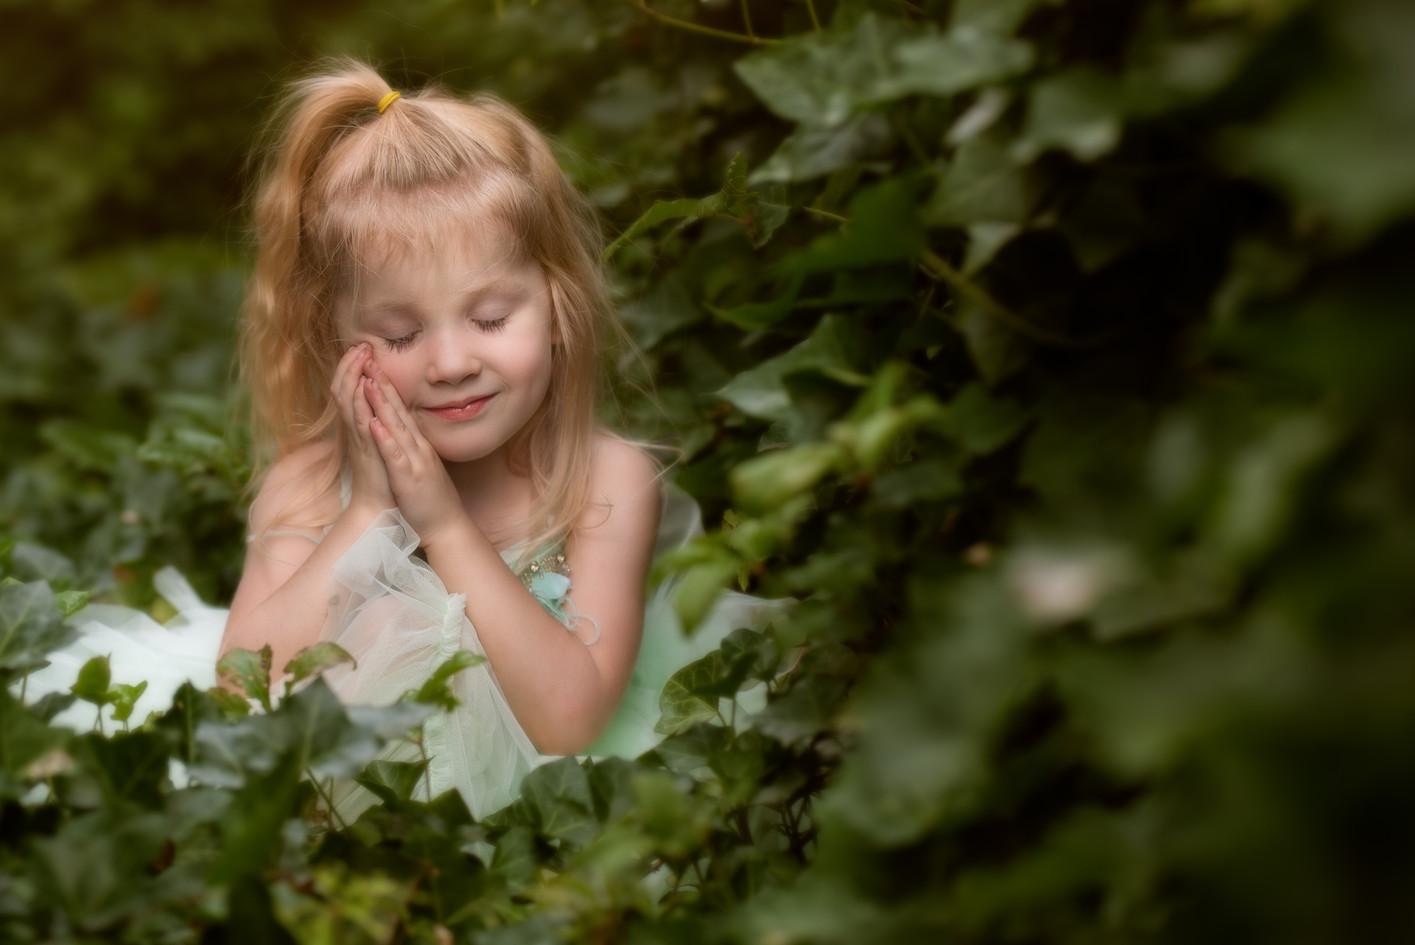 Little Girl Sitting in Ivy